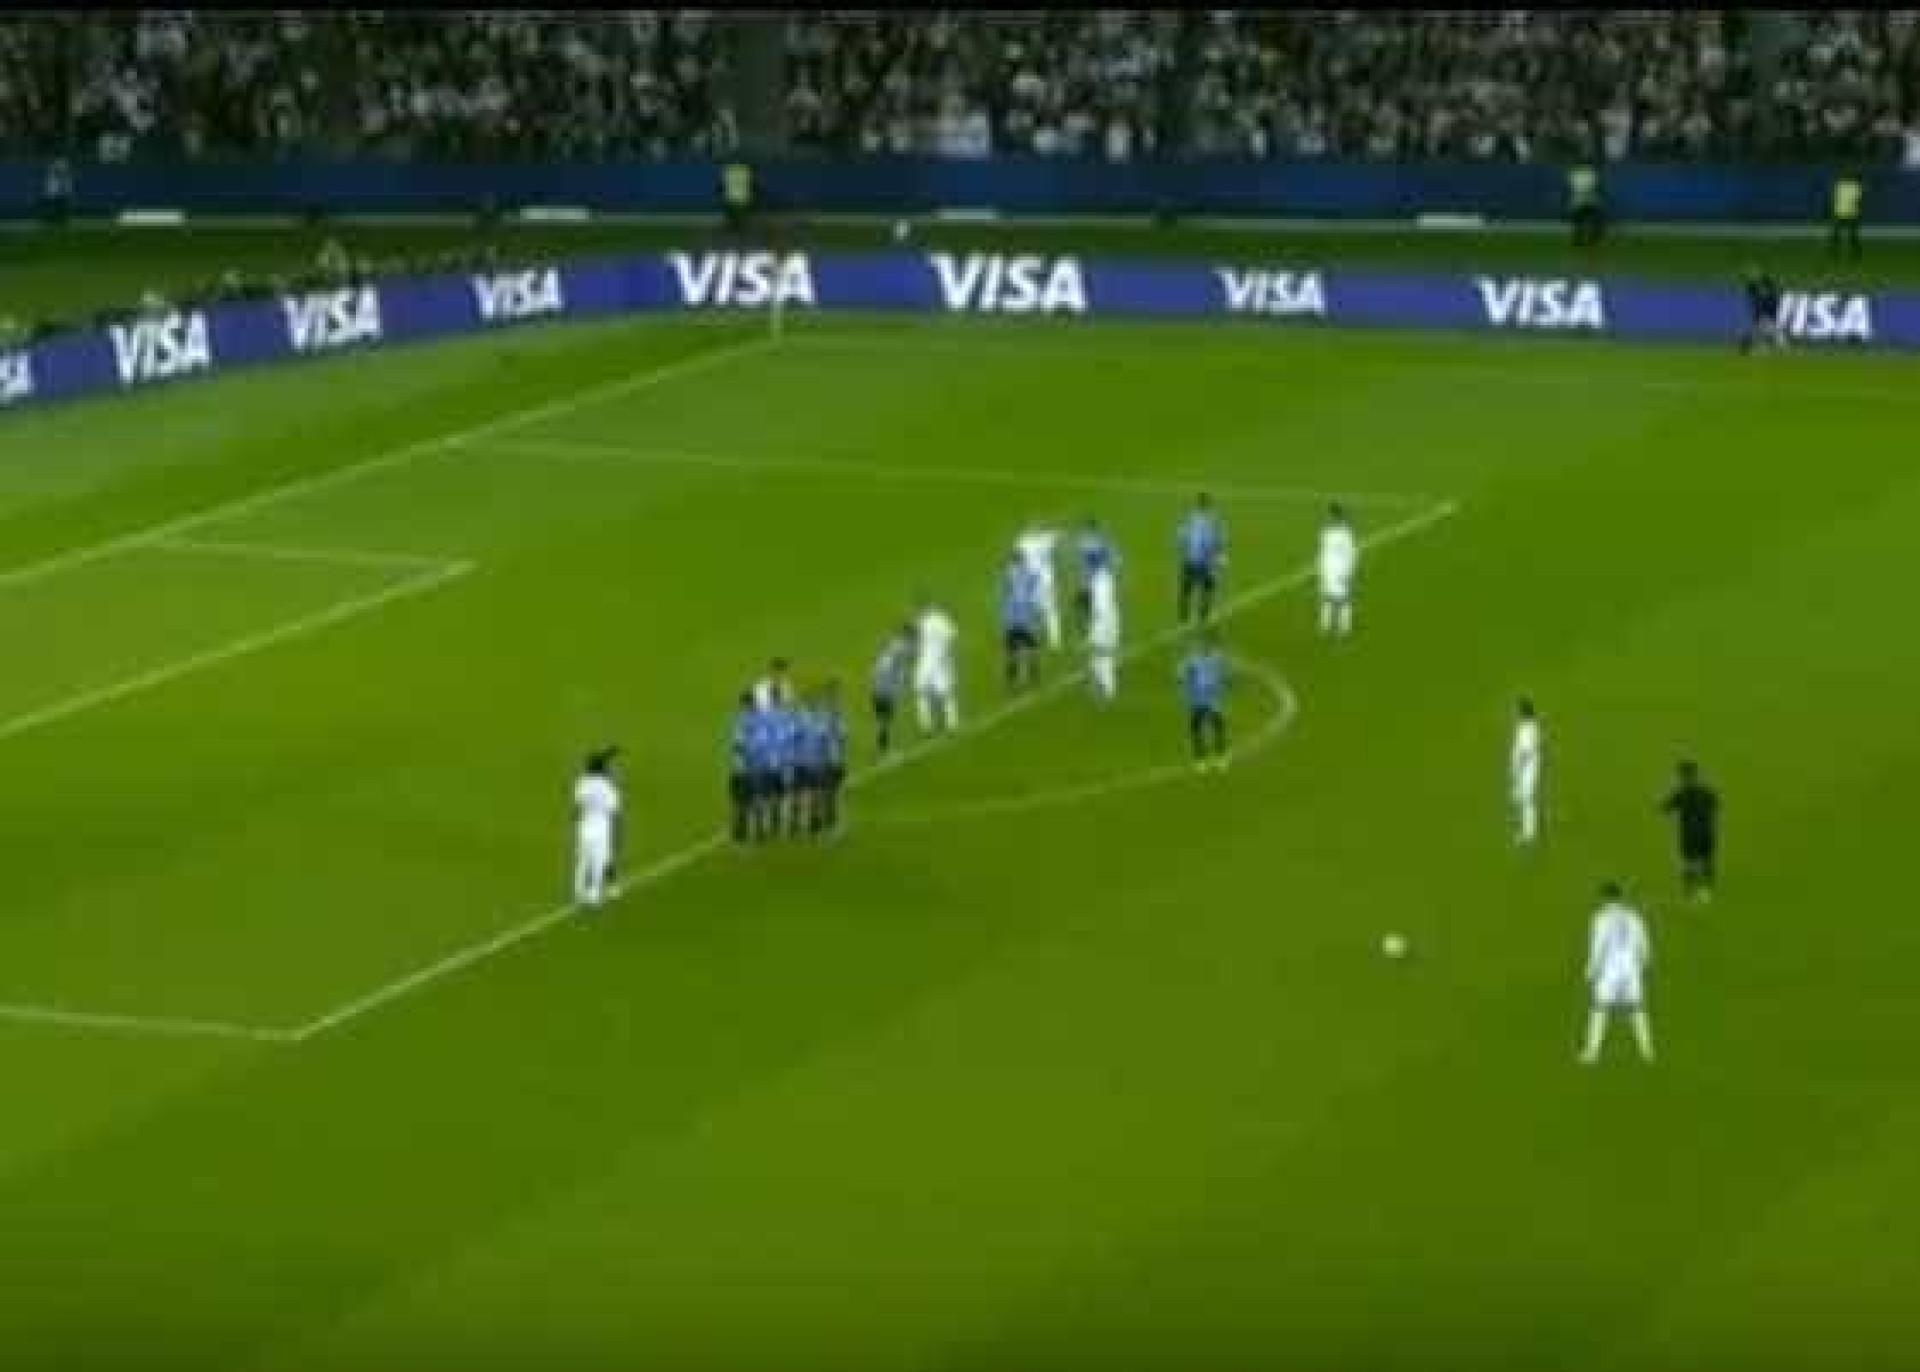 Ronaldo voltou a marcar no Mundial de Clubes e fê-lo de forma exímia